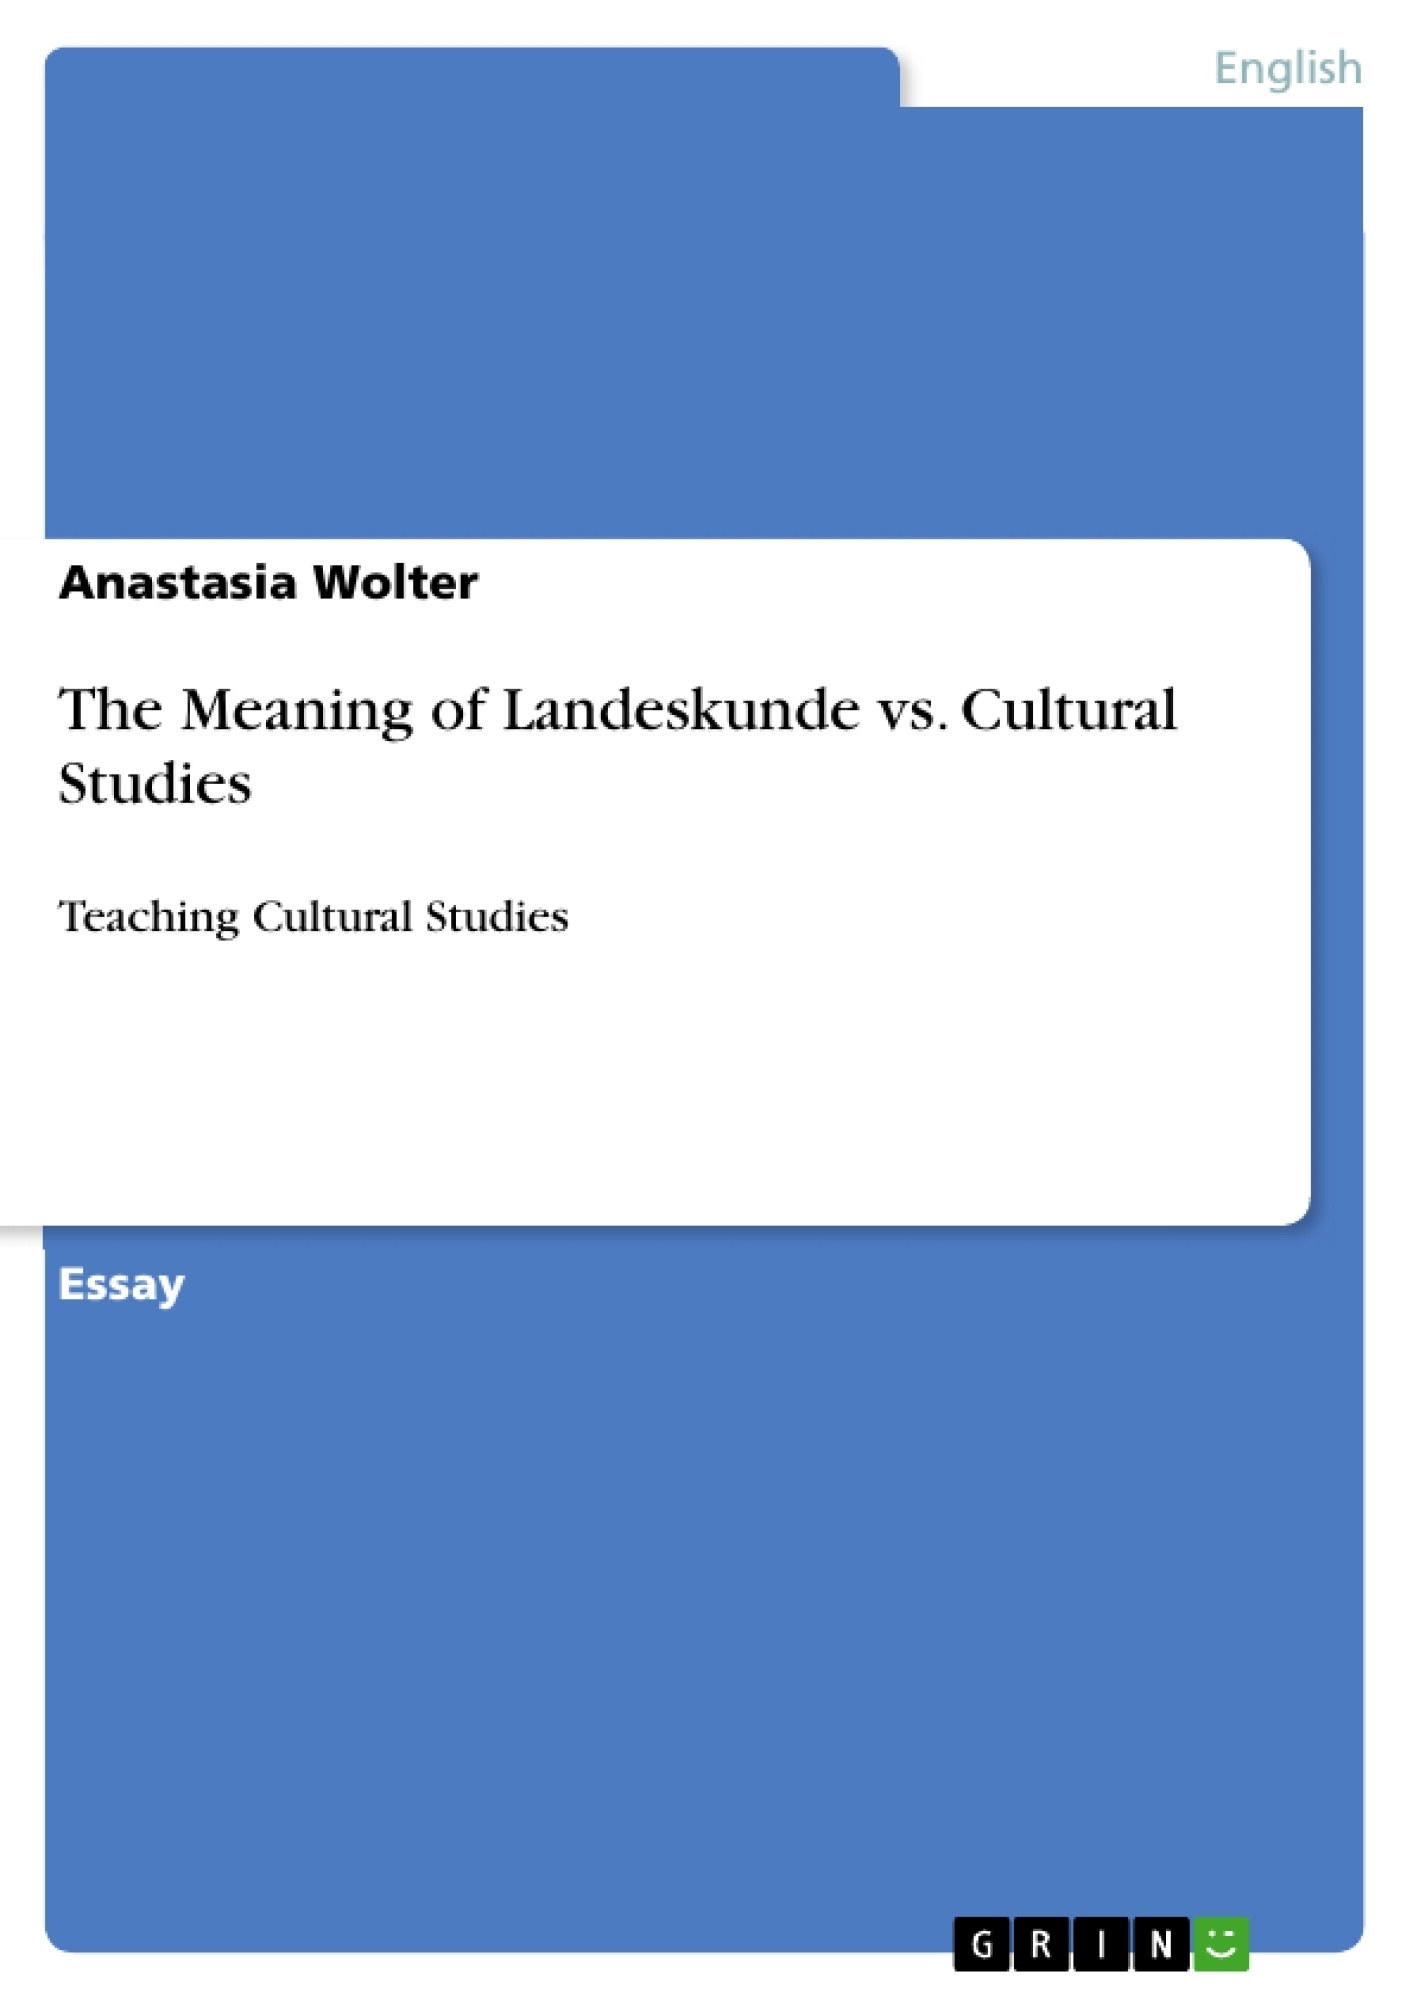 Title: The Meaning of Landeskunde vs. Cultural Studies